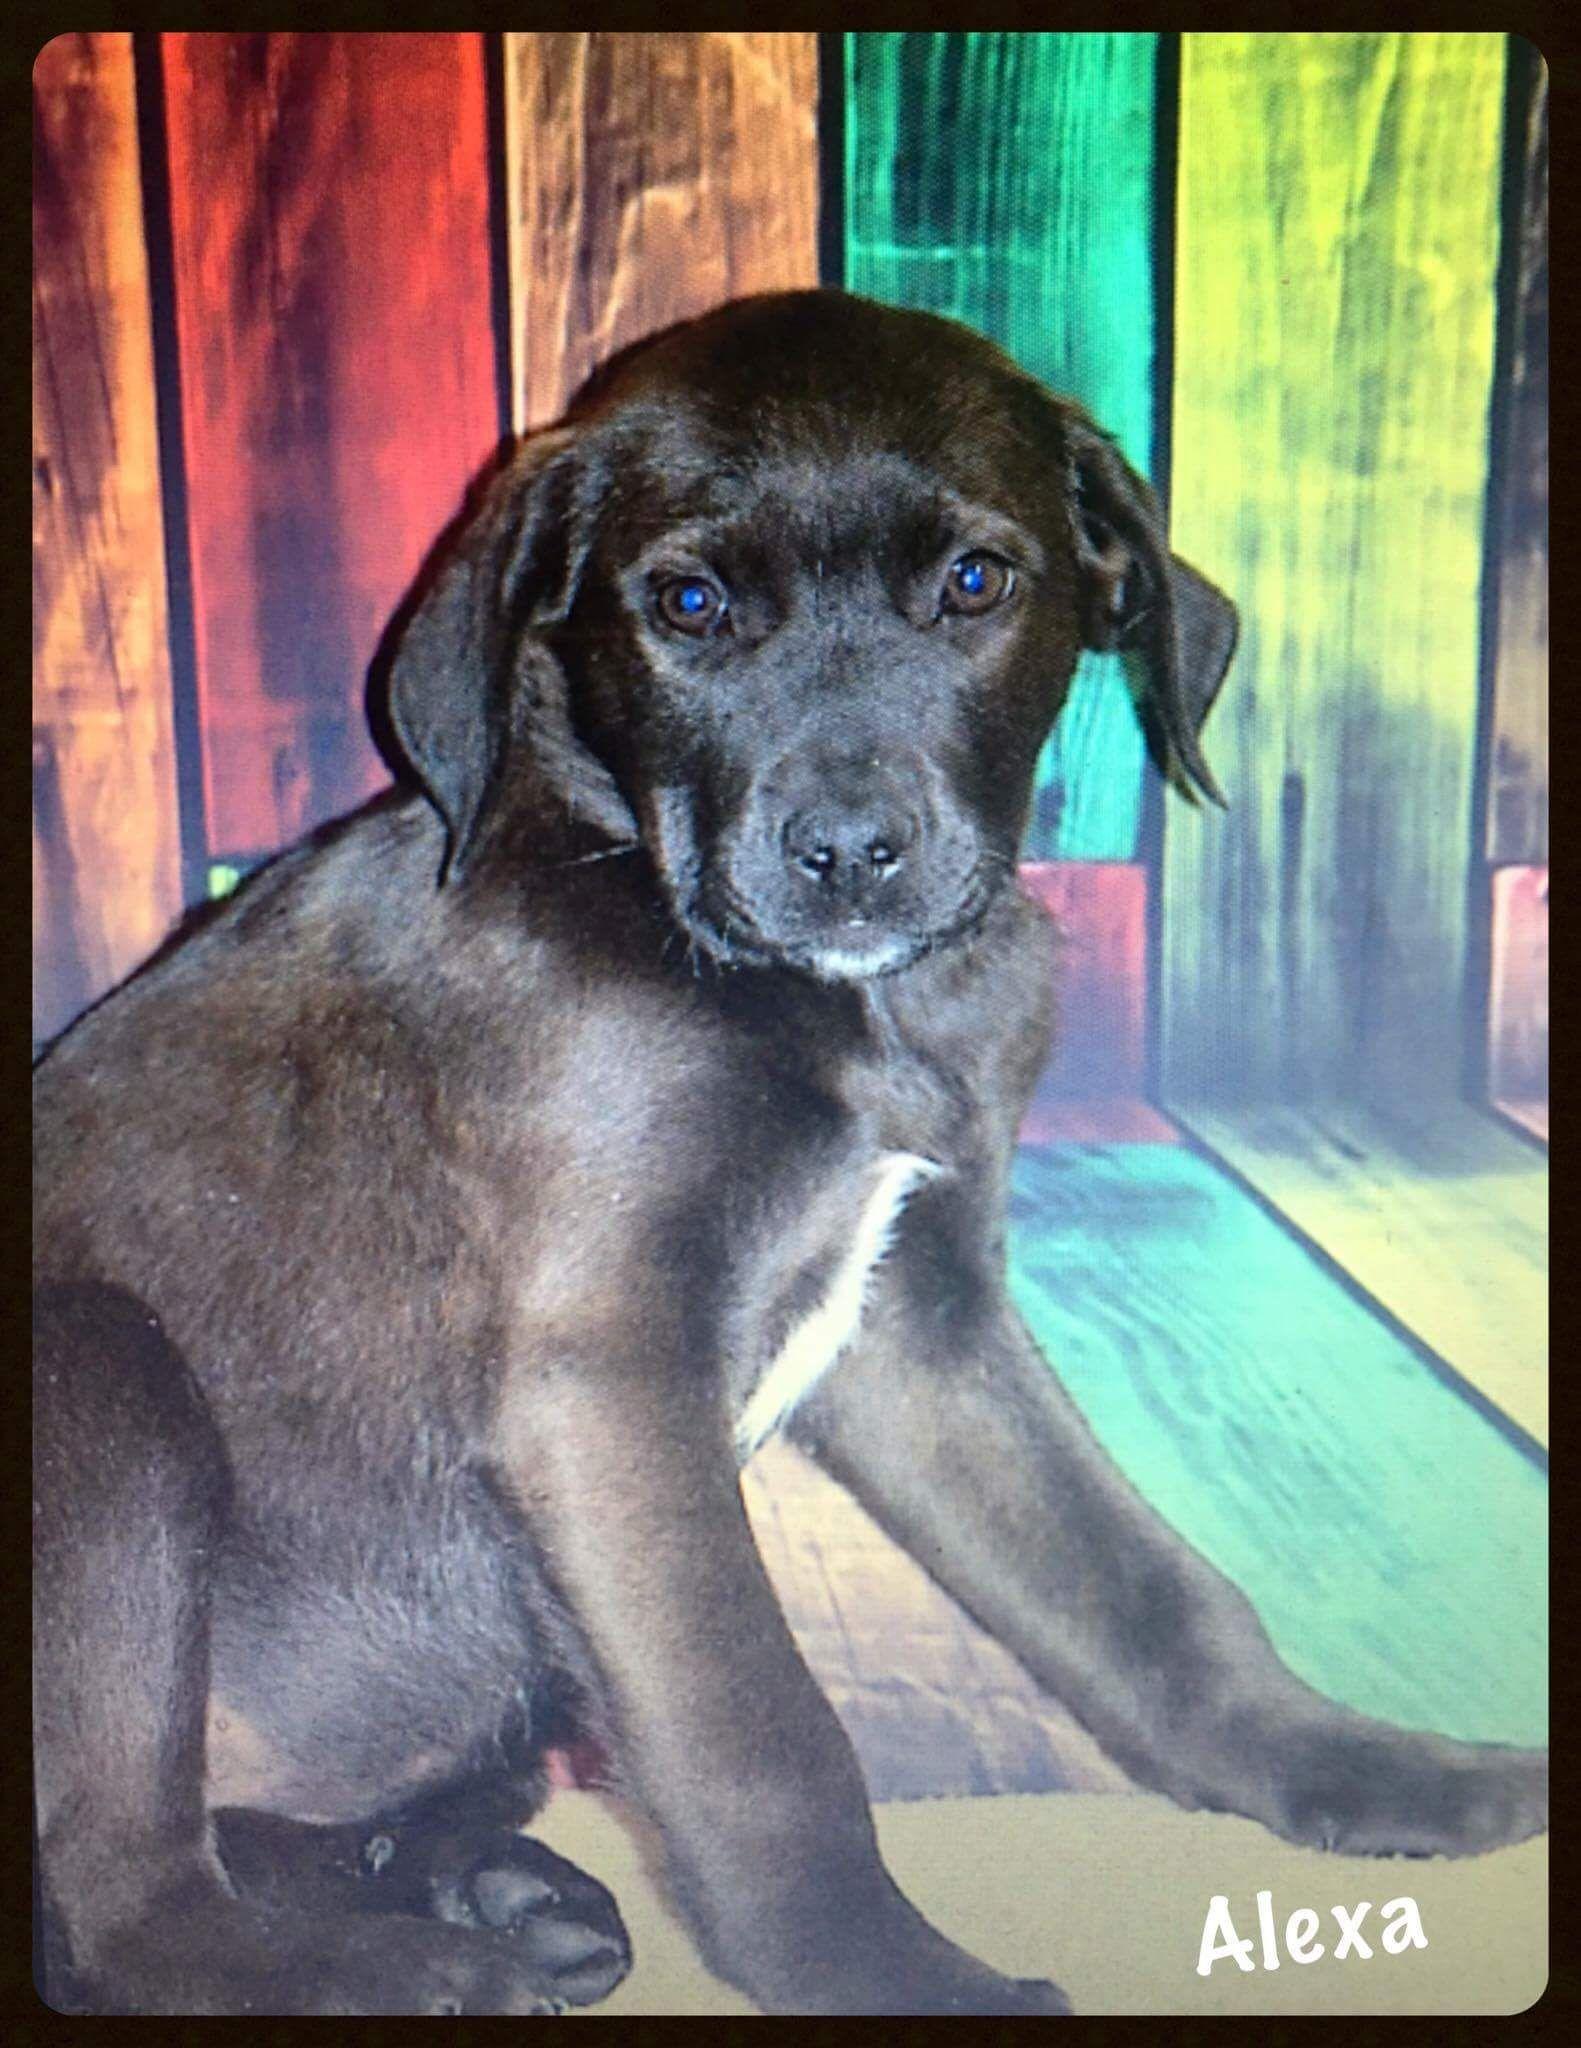 Boxador Dog For Adoption In Minneapolis Mn Adn 498457 On Puppyfinder Com Gender Female Age Baby Nickname Alexa Dog Adoption Dogs Animals